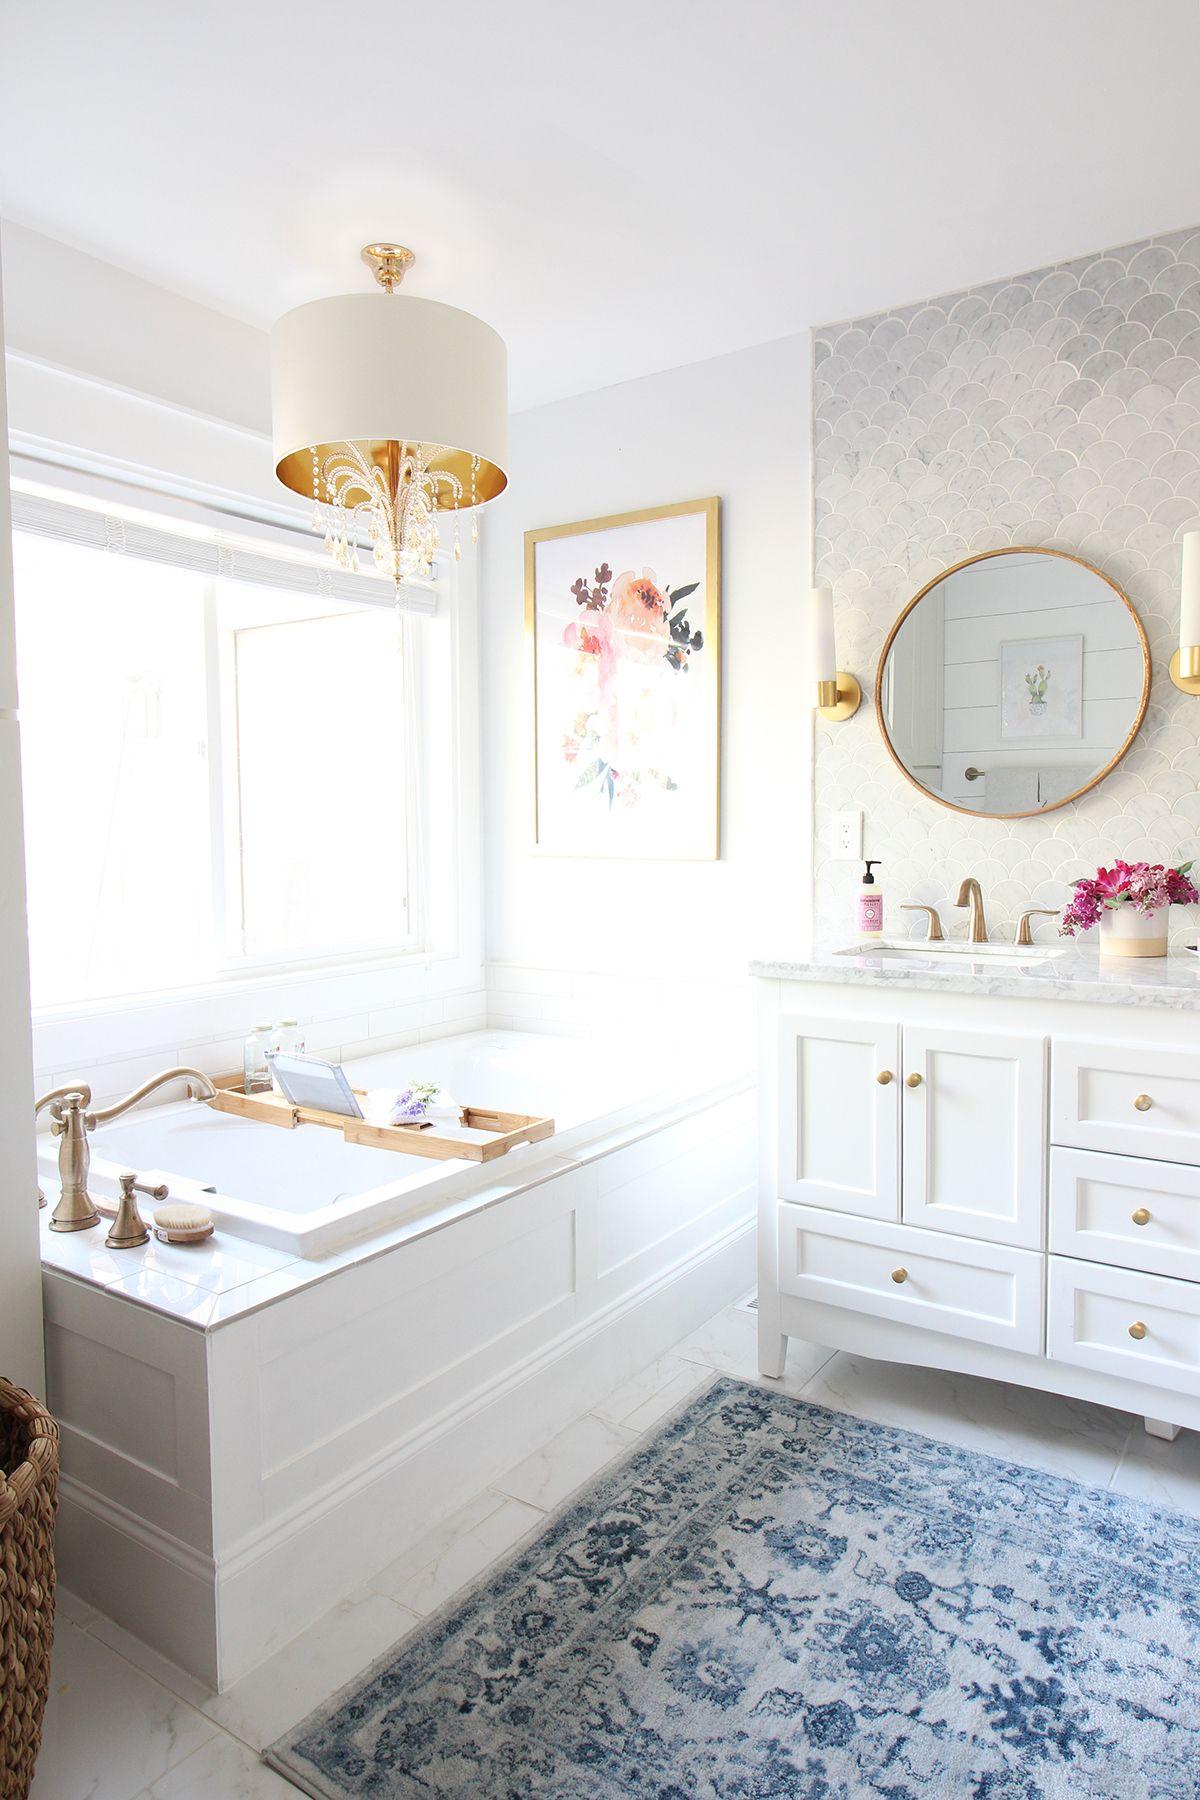 Prescott view home reno master bathroom reveal for Floor decor reno